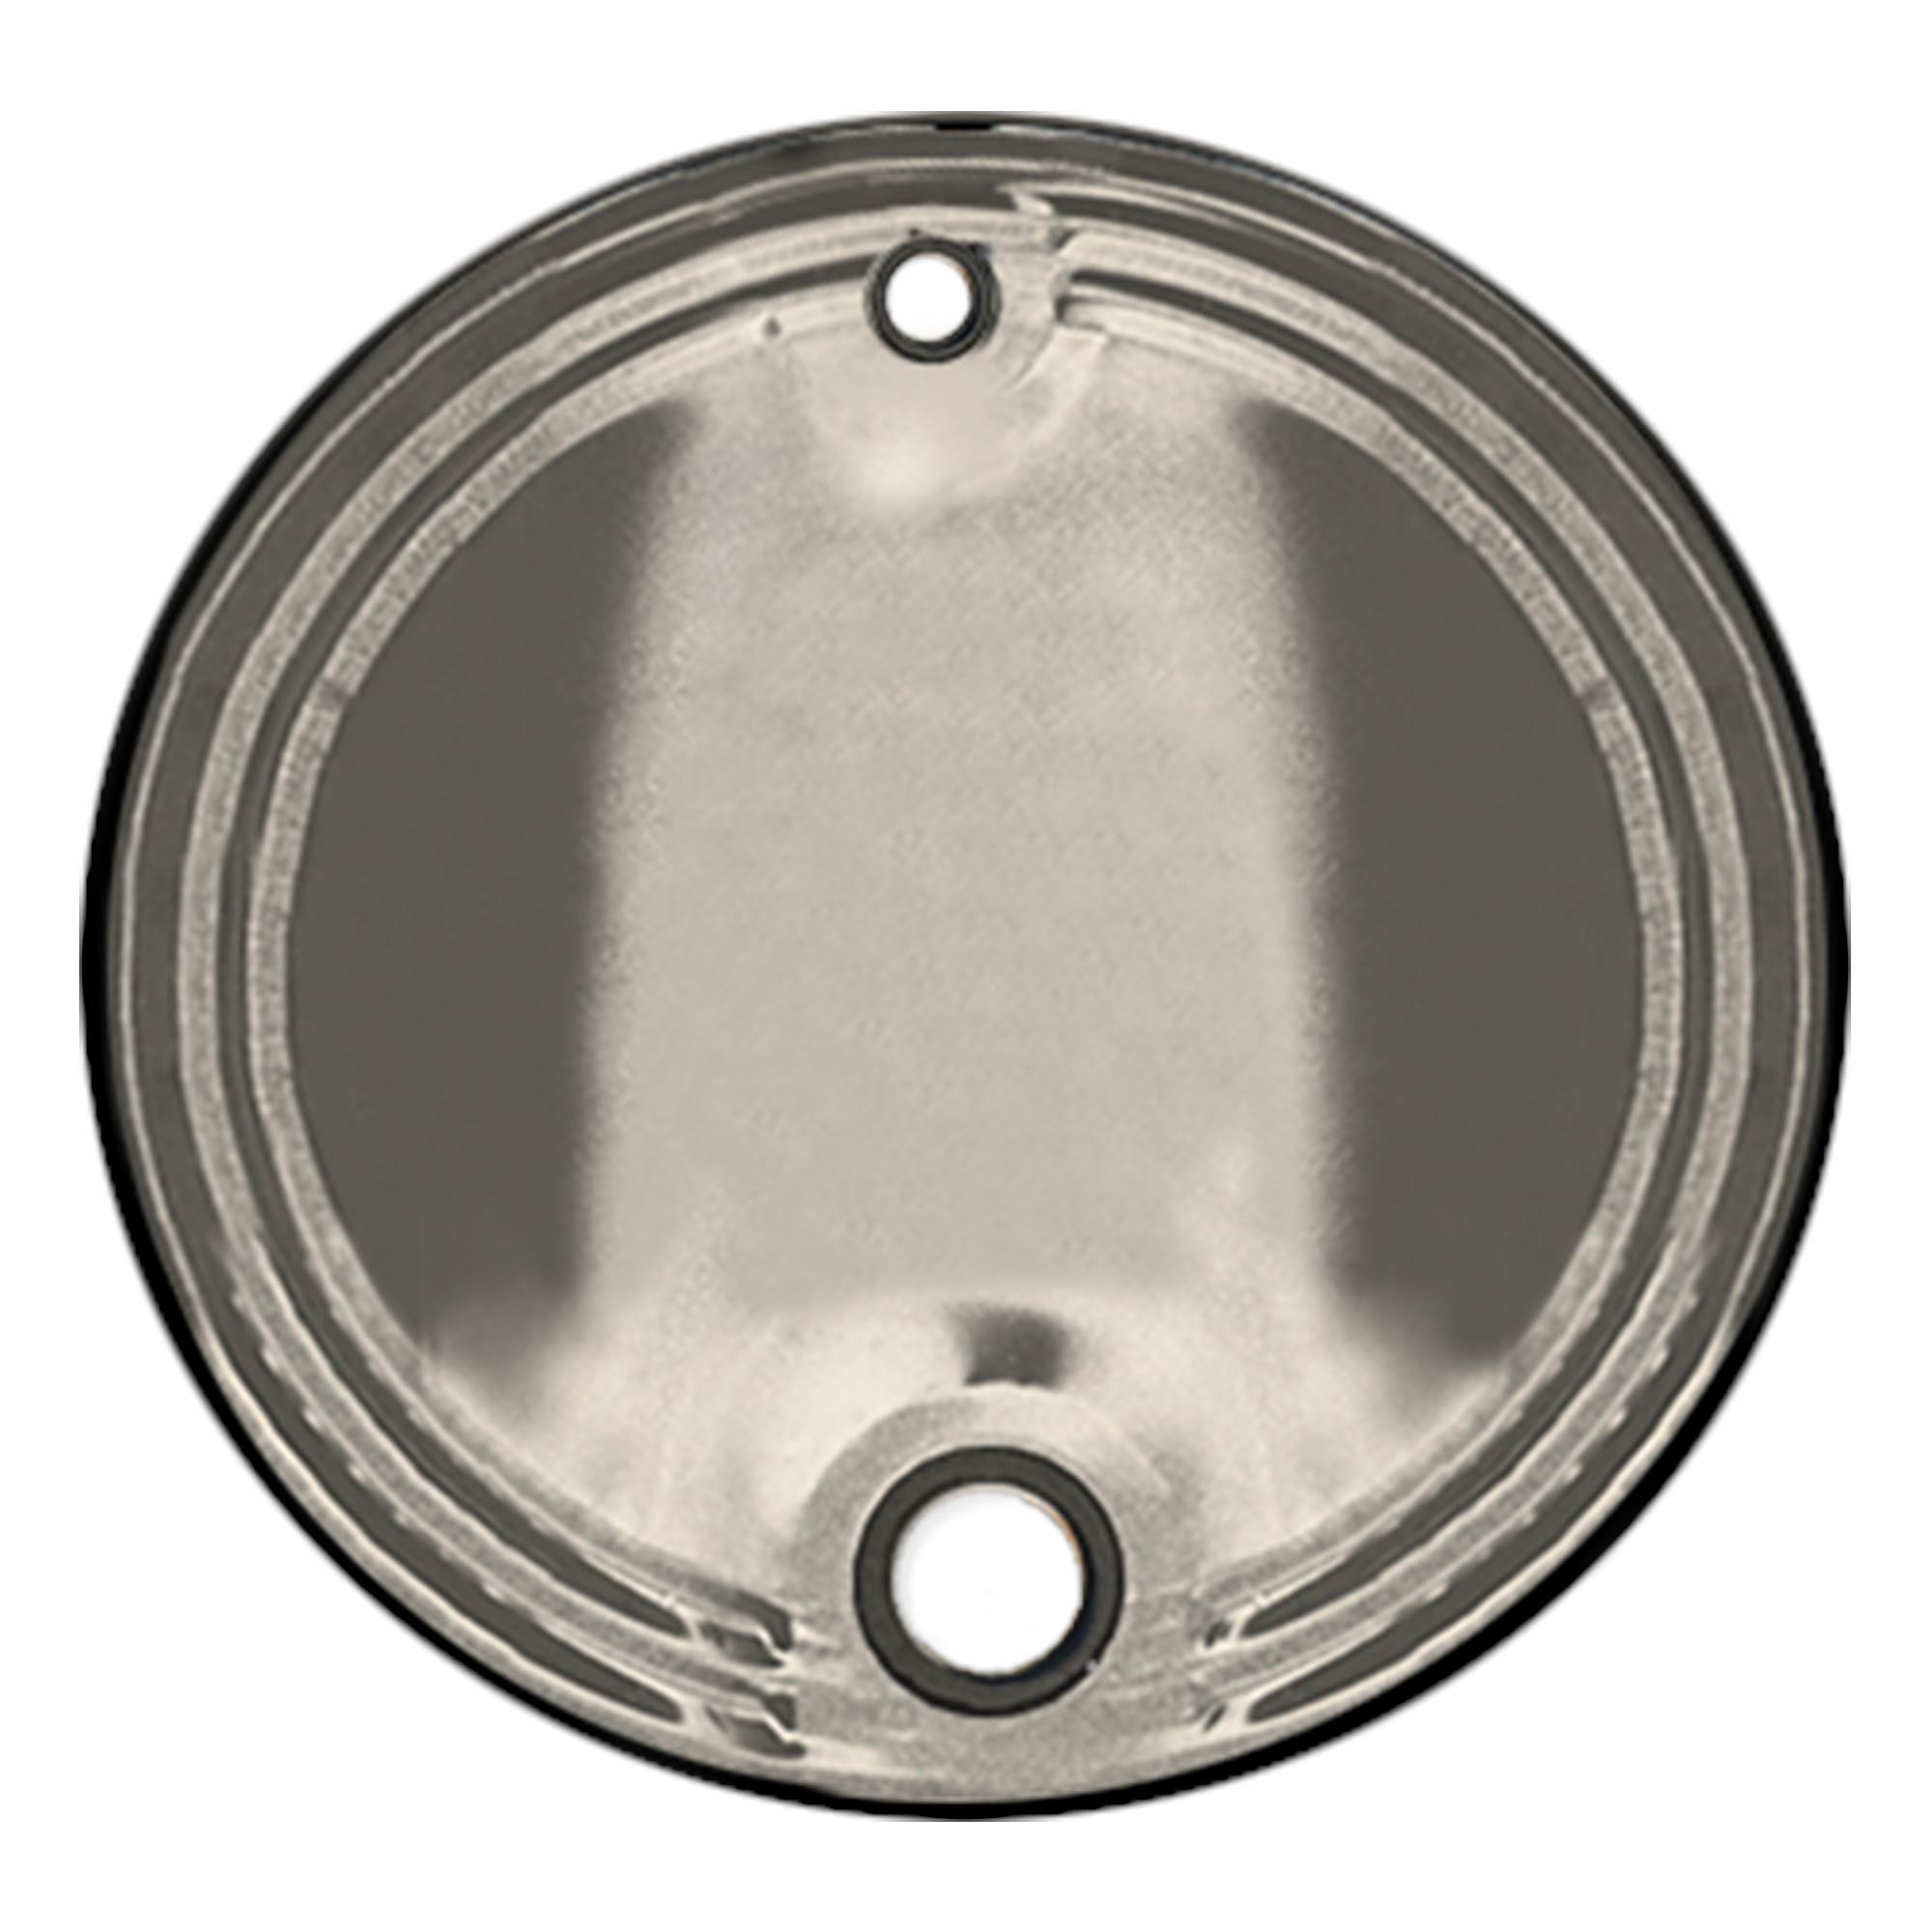 Model 6818 55 Gallon Drum lid